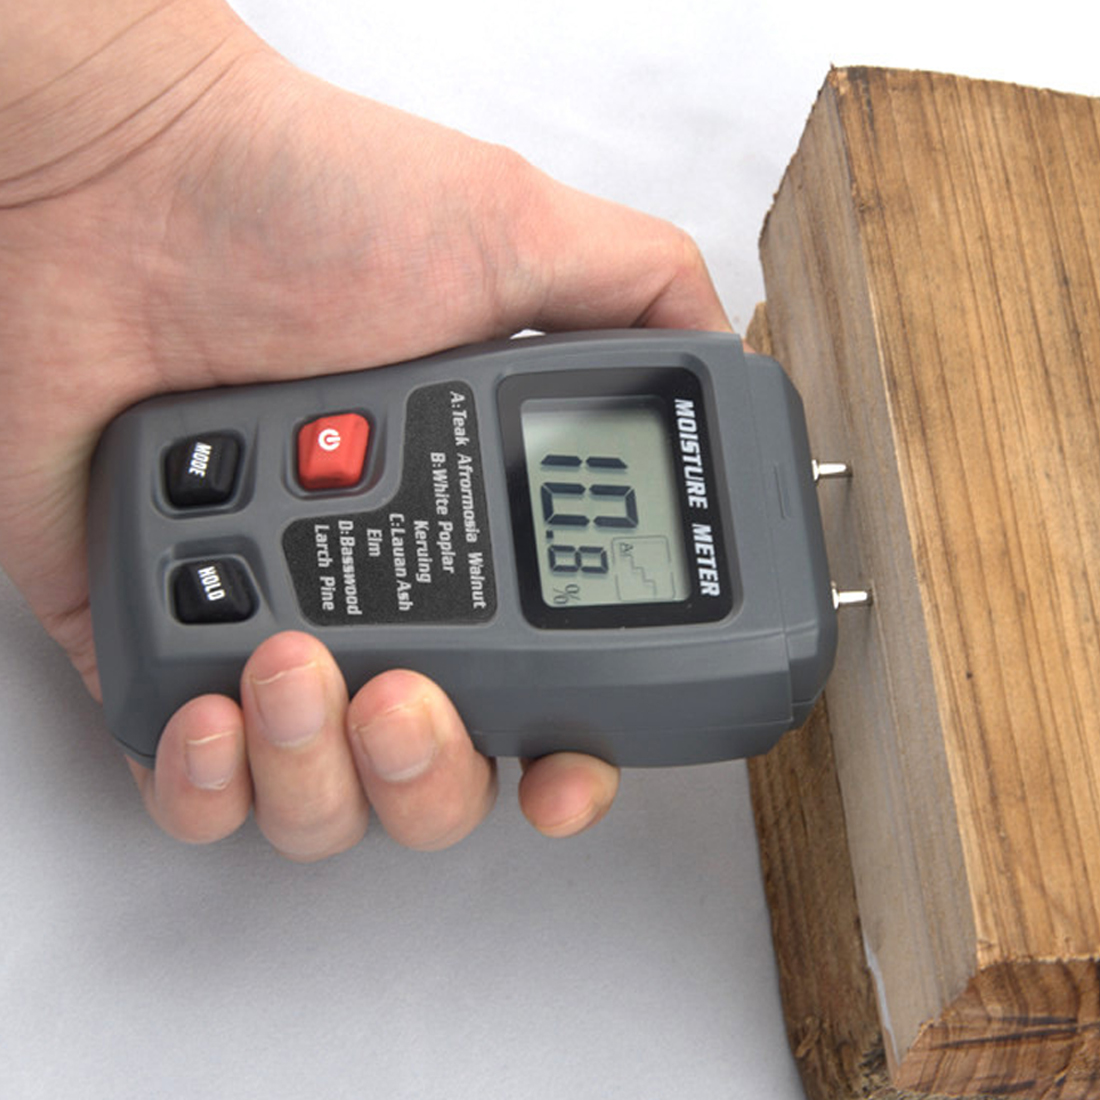 Timber Damp Detector 0.5 Percent Accuracy Moisture Meter Test  Two Pins Digital Wood Moisture Meter Humidity Tester 0-99.9% Timber Damp Detector 0.5 Percent Accuracy Moisture Meter Test  Two Pins Digital Wood Moisture Meter Humidity Tester 0-99.9%